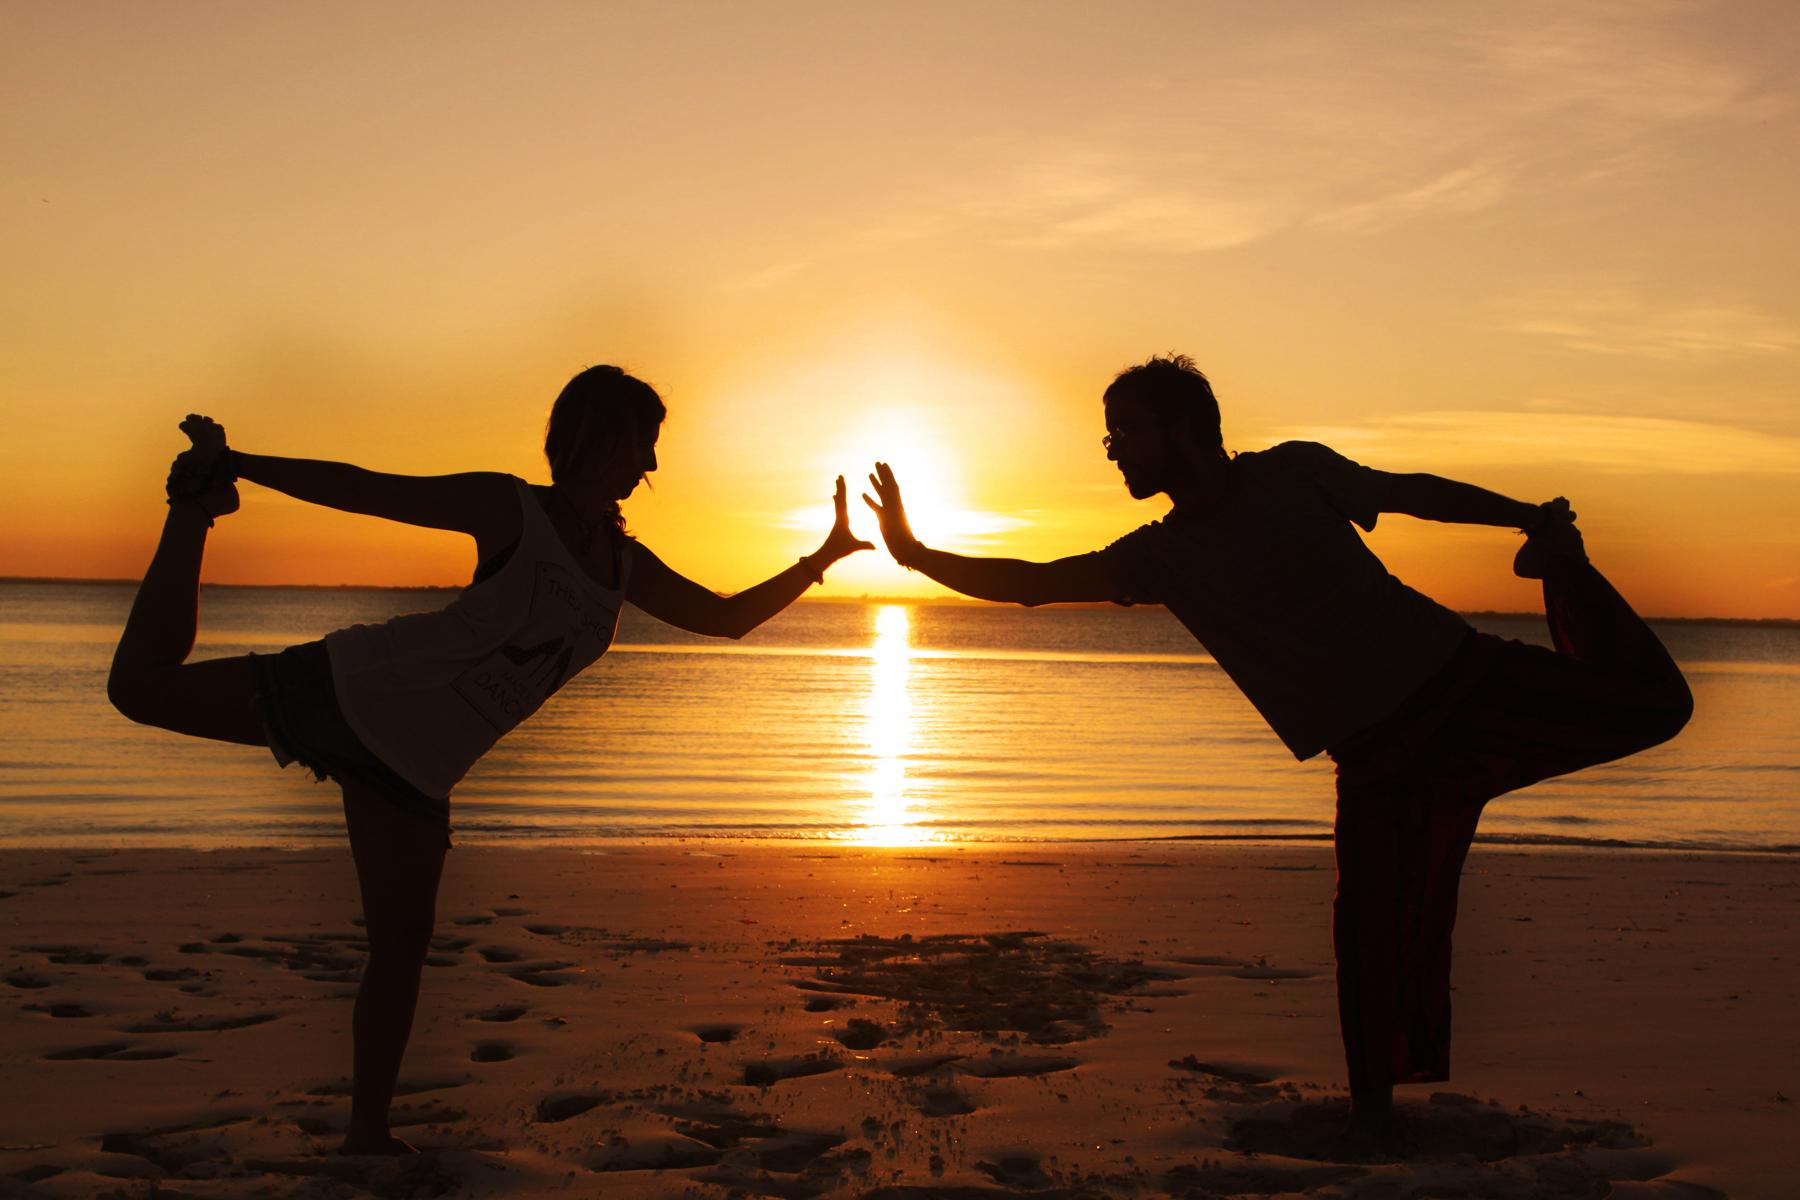 La mente non siamo noi Sunset-yoga-partner-y